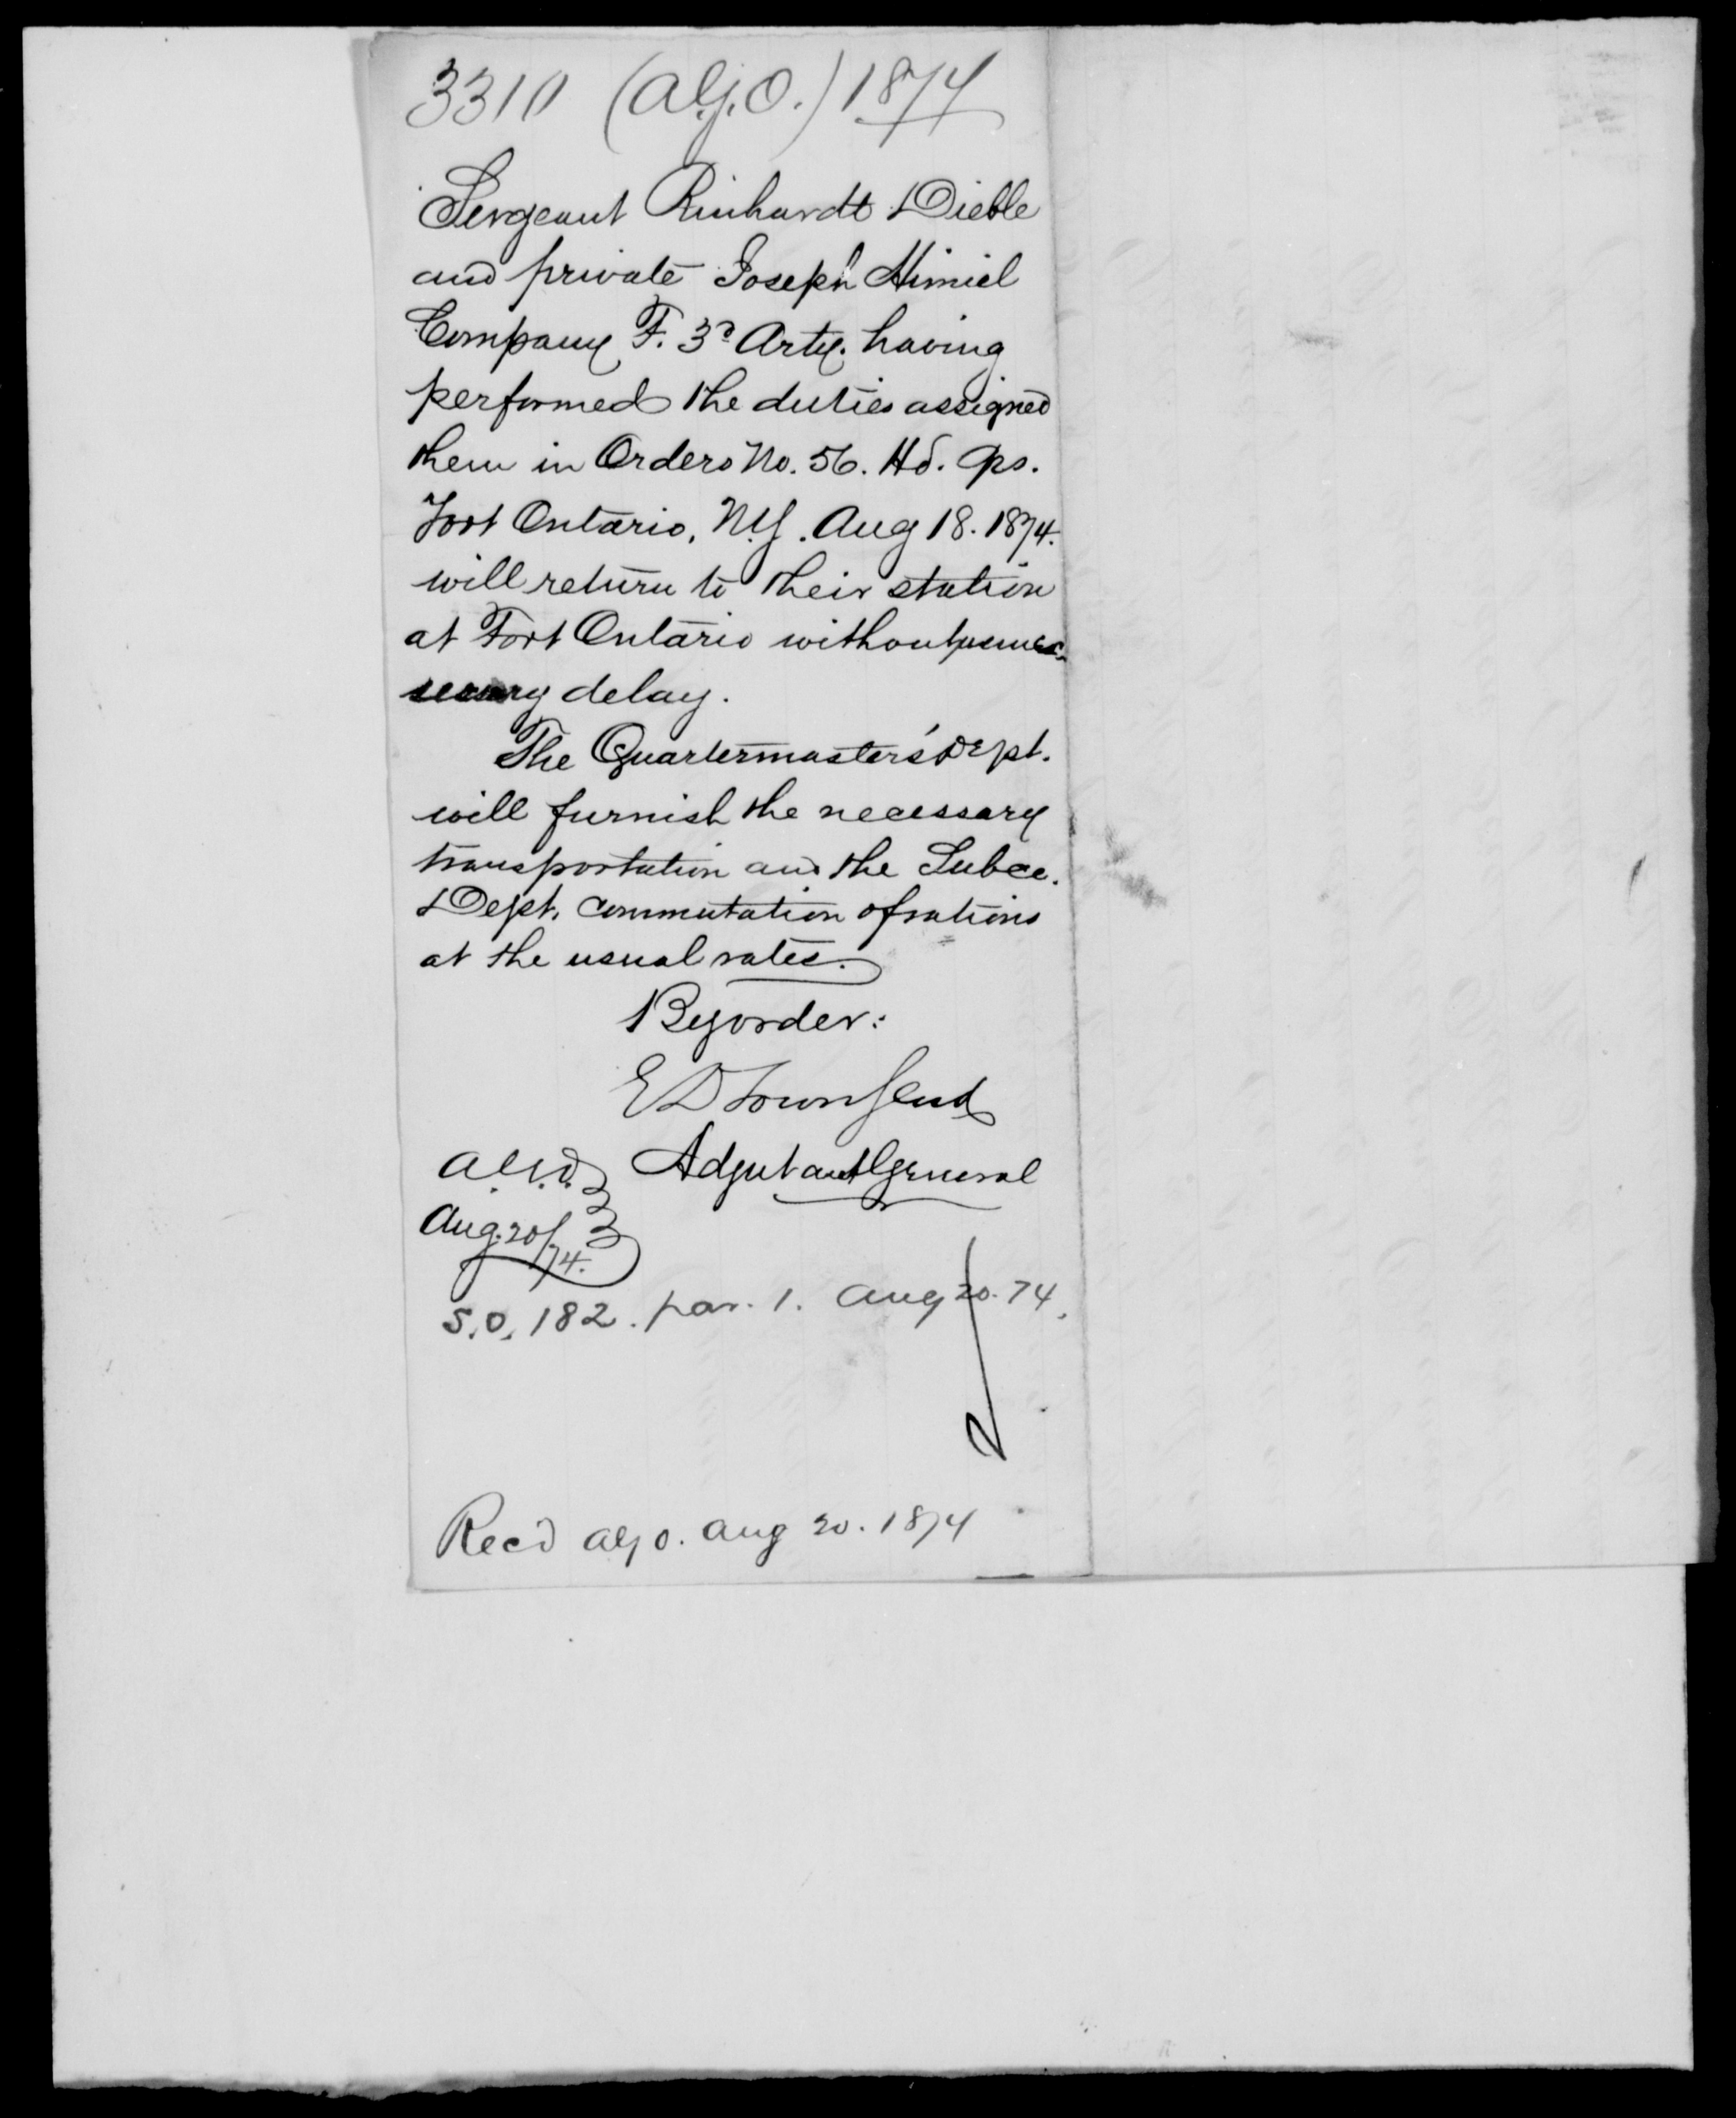 1874 - File No. 3310 (Danes, H C - New York)